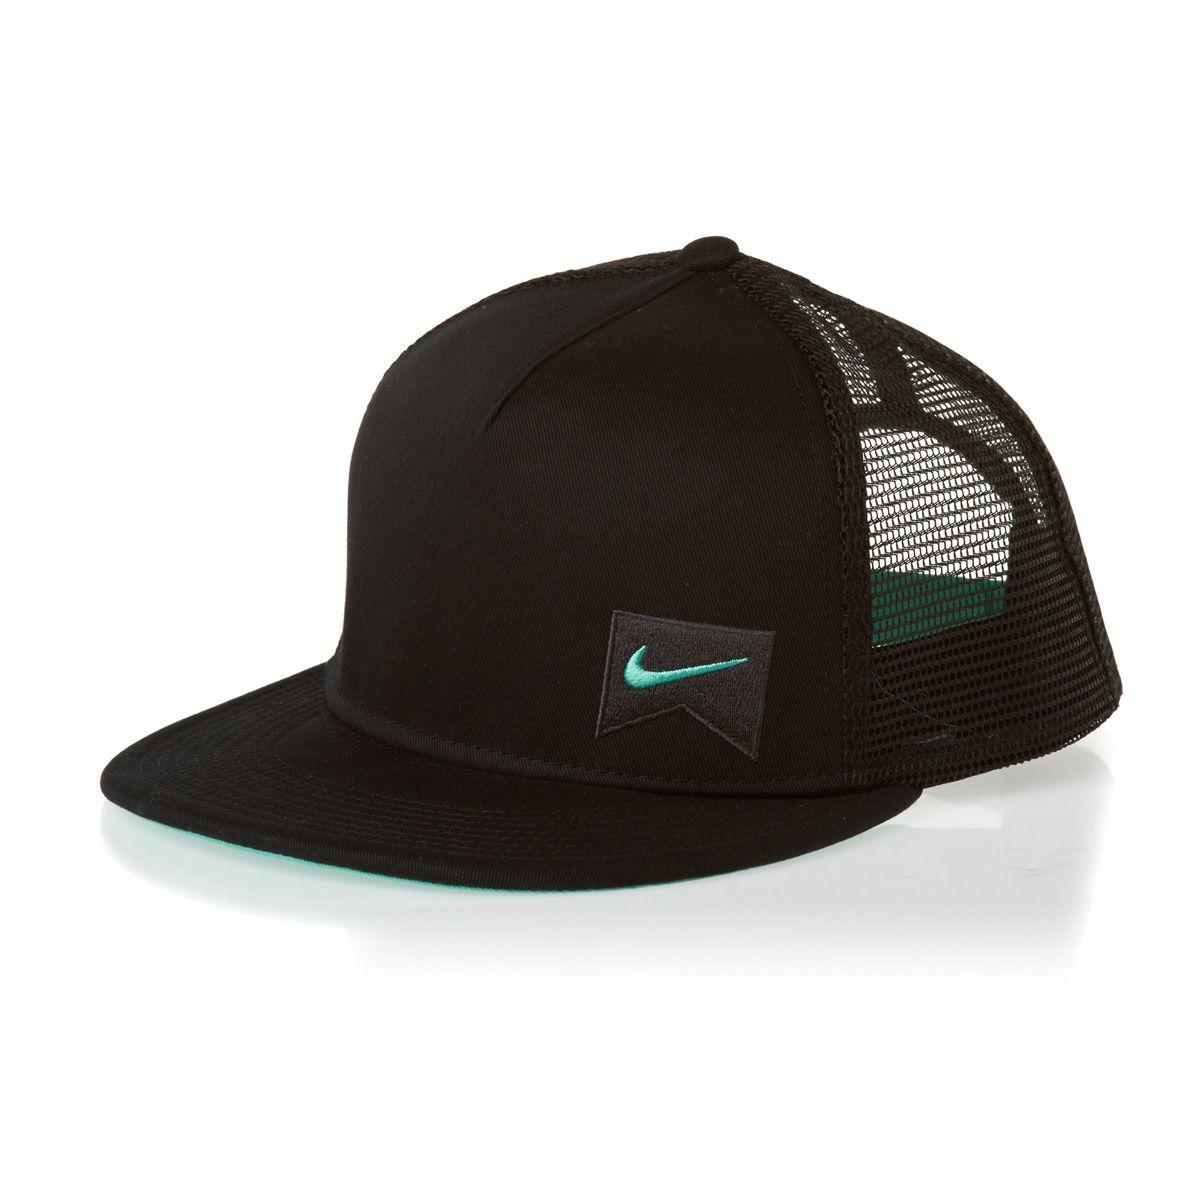 0c5e35db752 Nike Skateboarding Icon Trucker Cap  streetwear  snapbacks  snapback   headwear  mensfashion  fashion  hats  hat  cap  caps